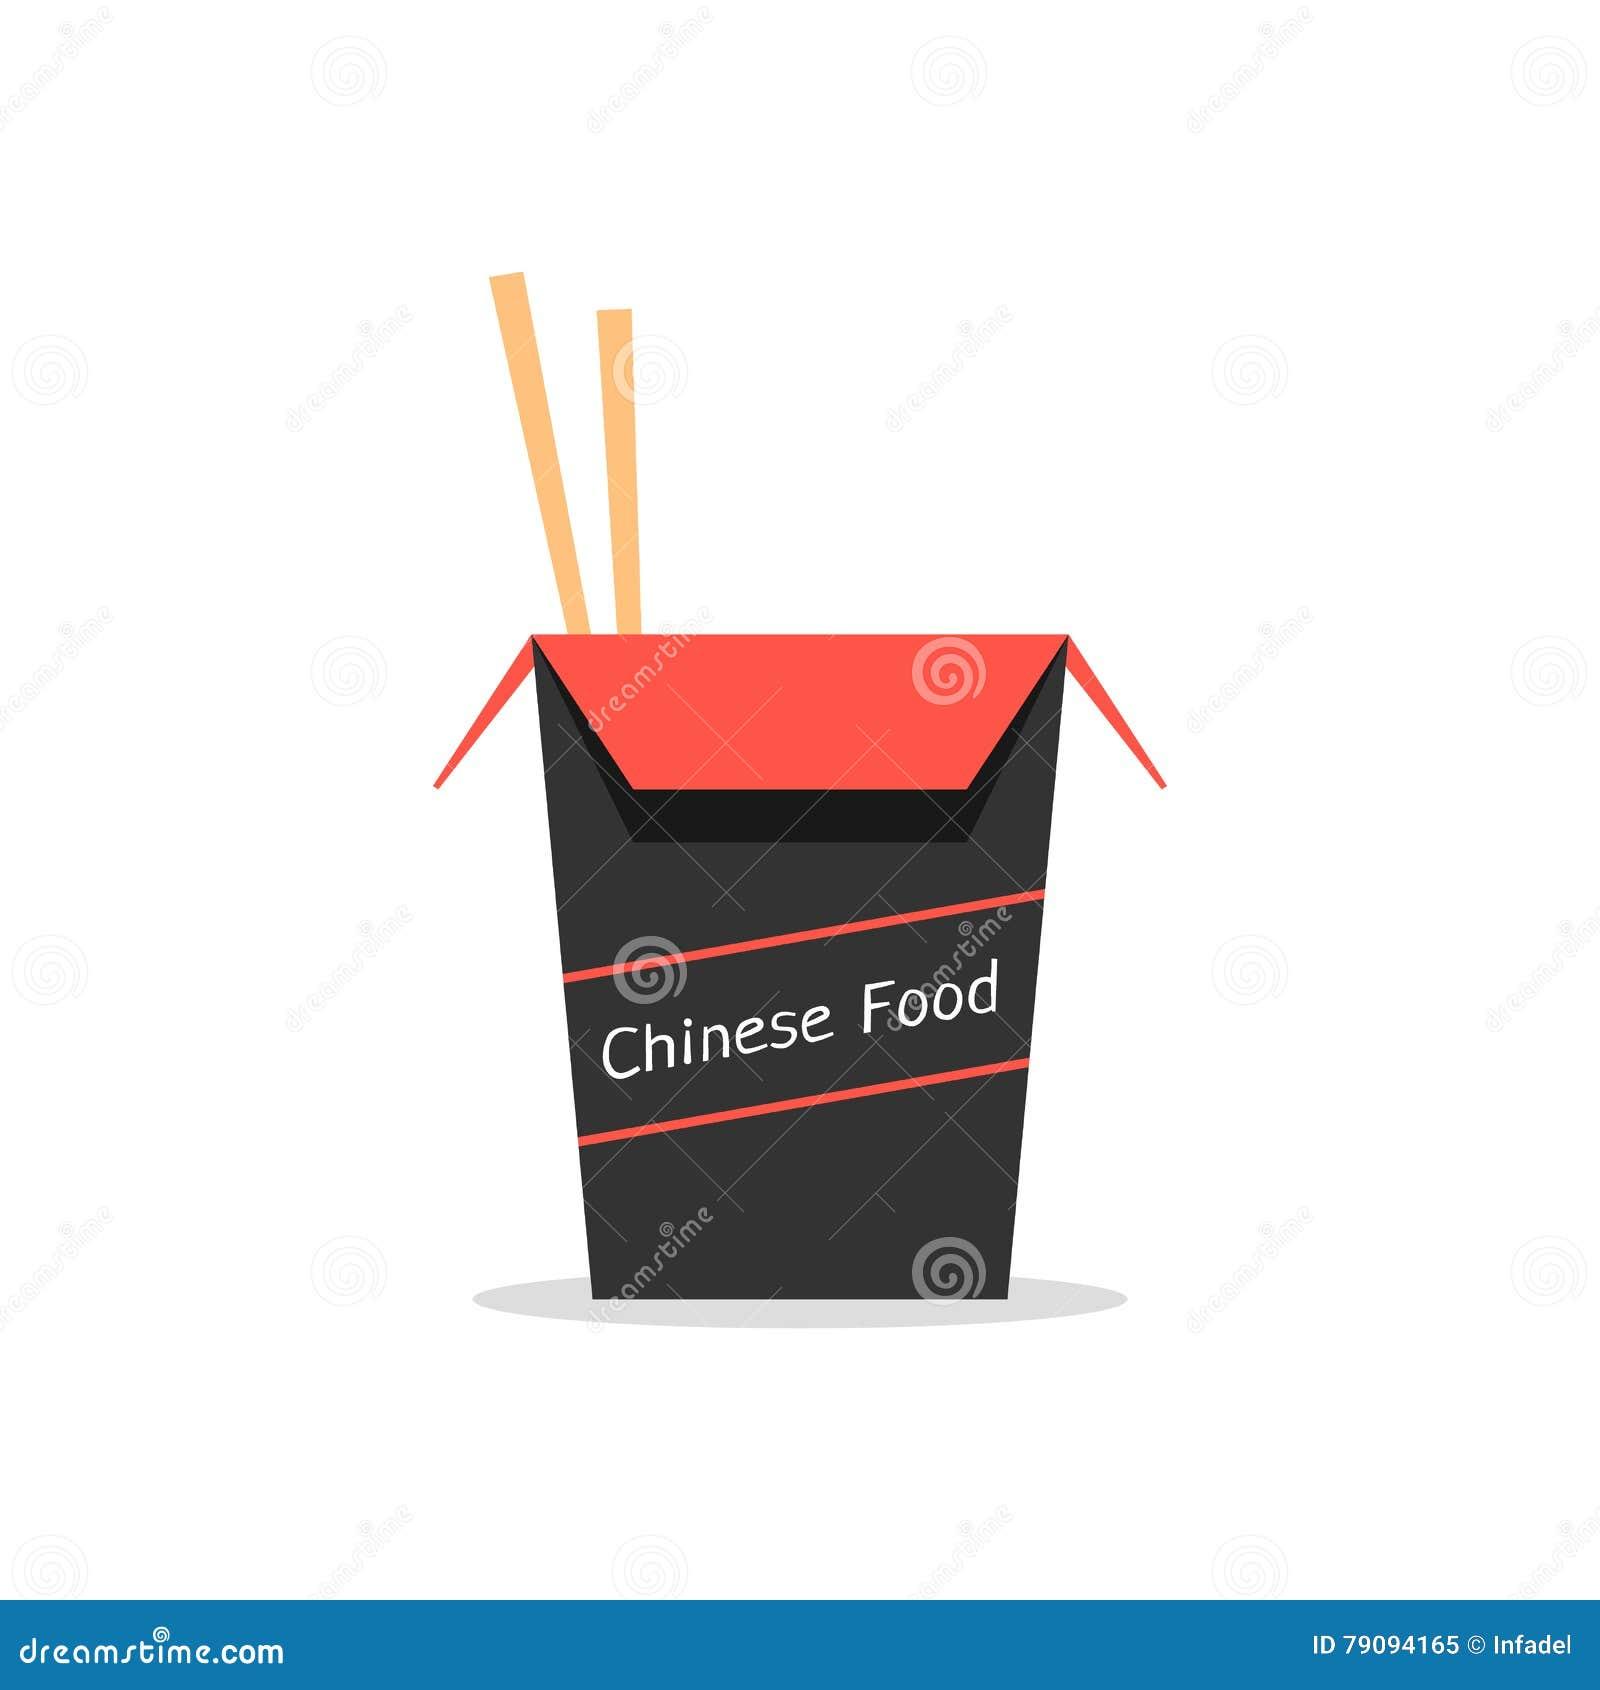 Cabin John Chinese Food